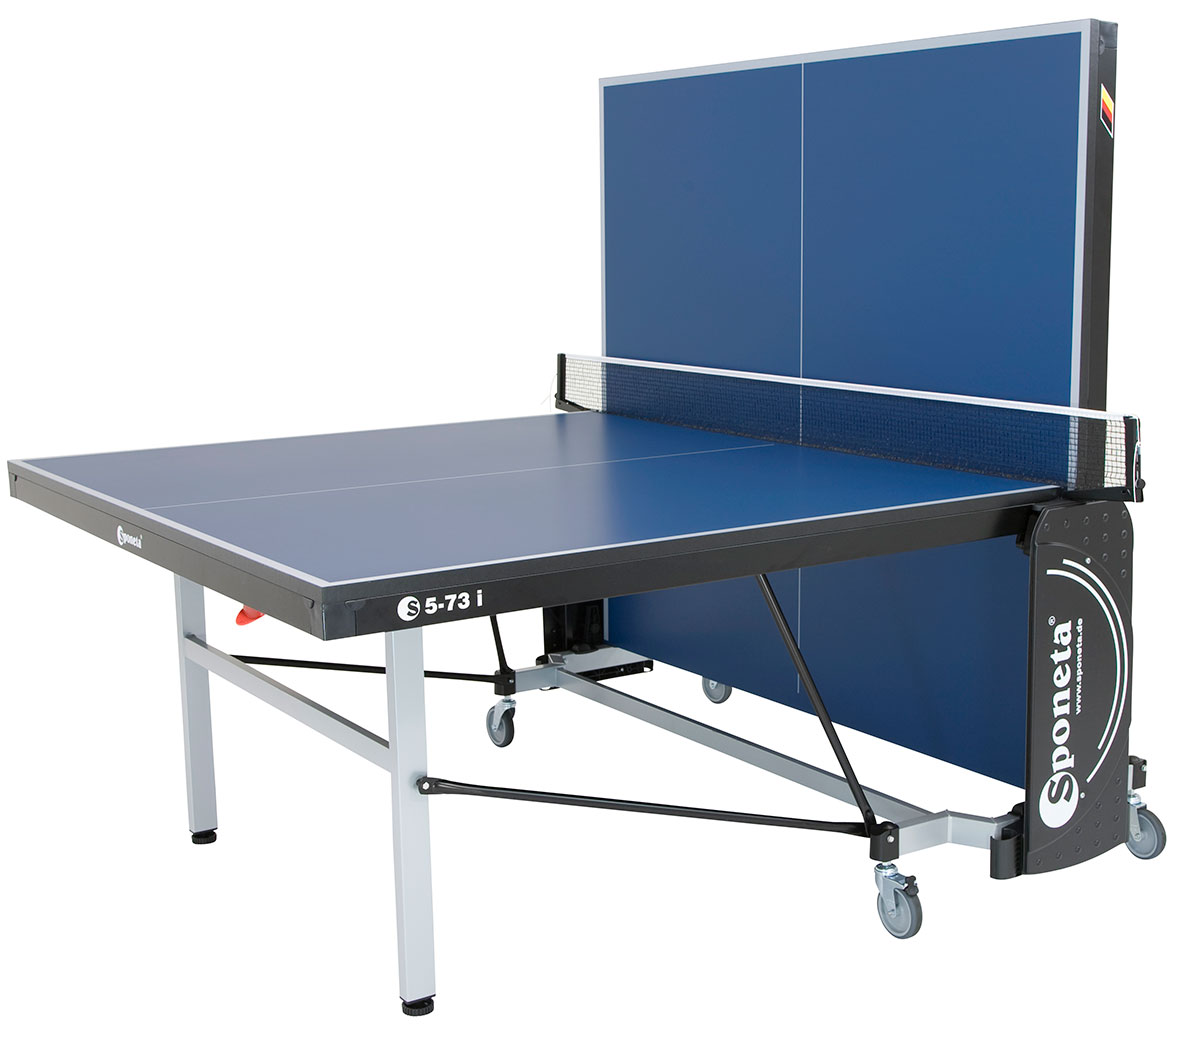 Thorntons table tennis table tennis table sponeta schooline 22 compact indoor s5 73i blue - Sponeta table tennis table ...